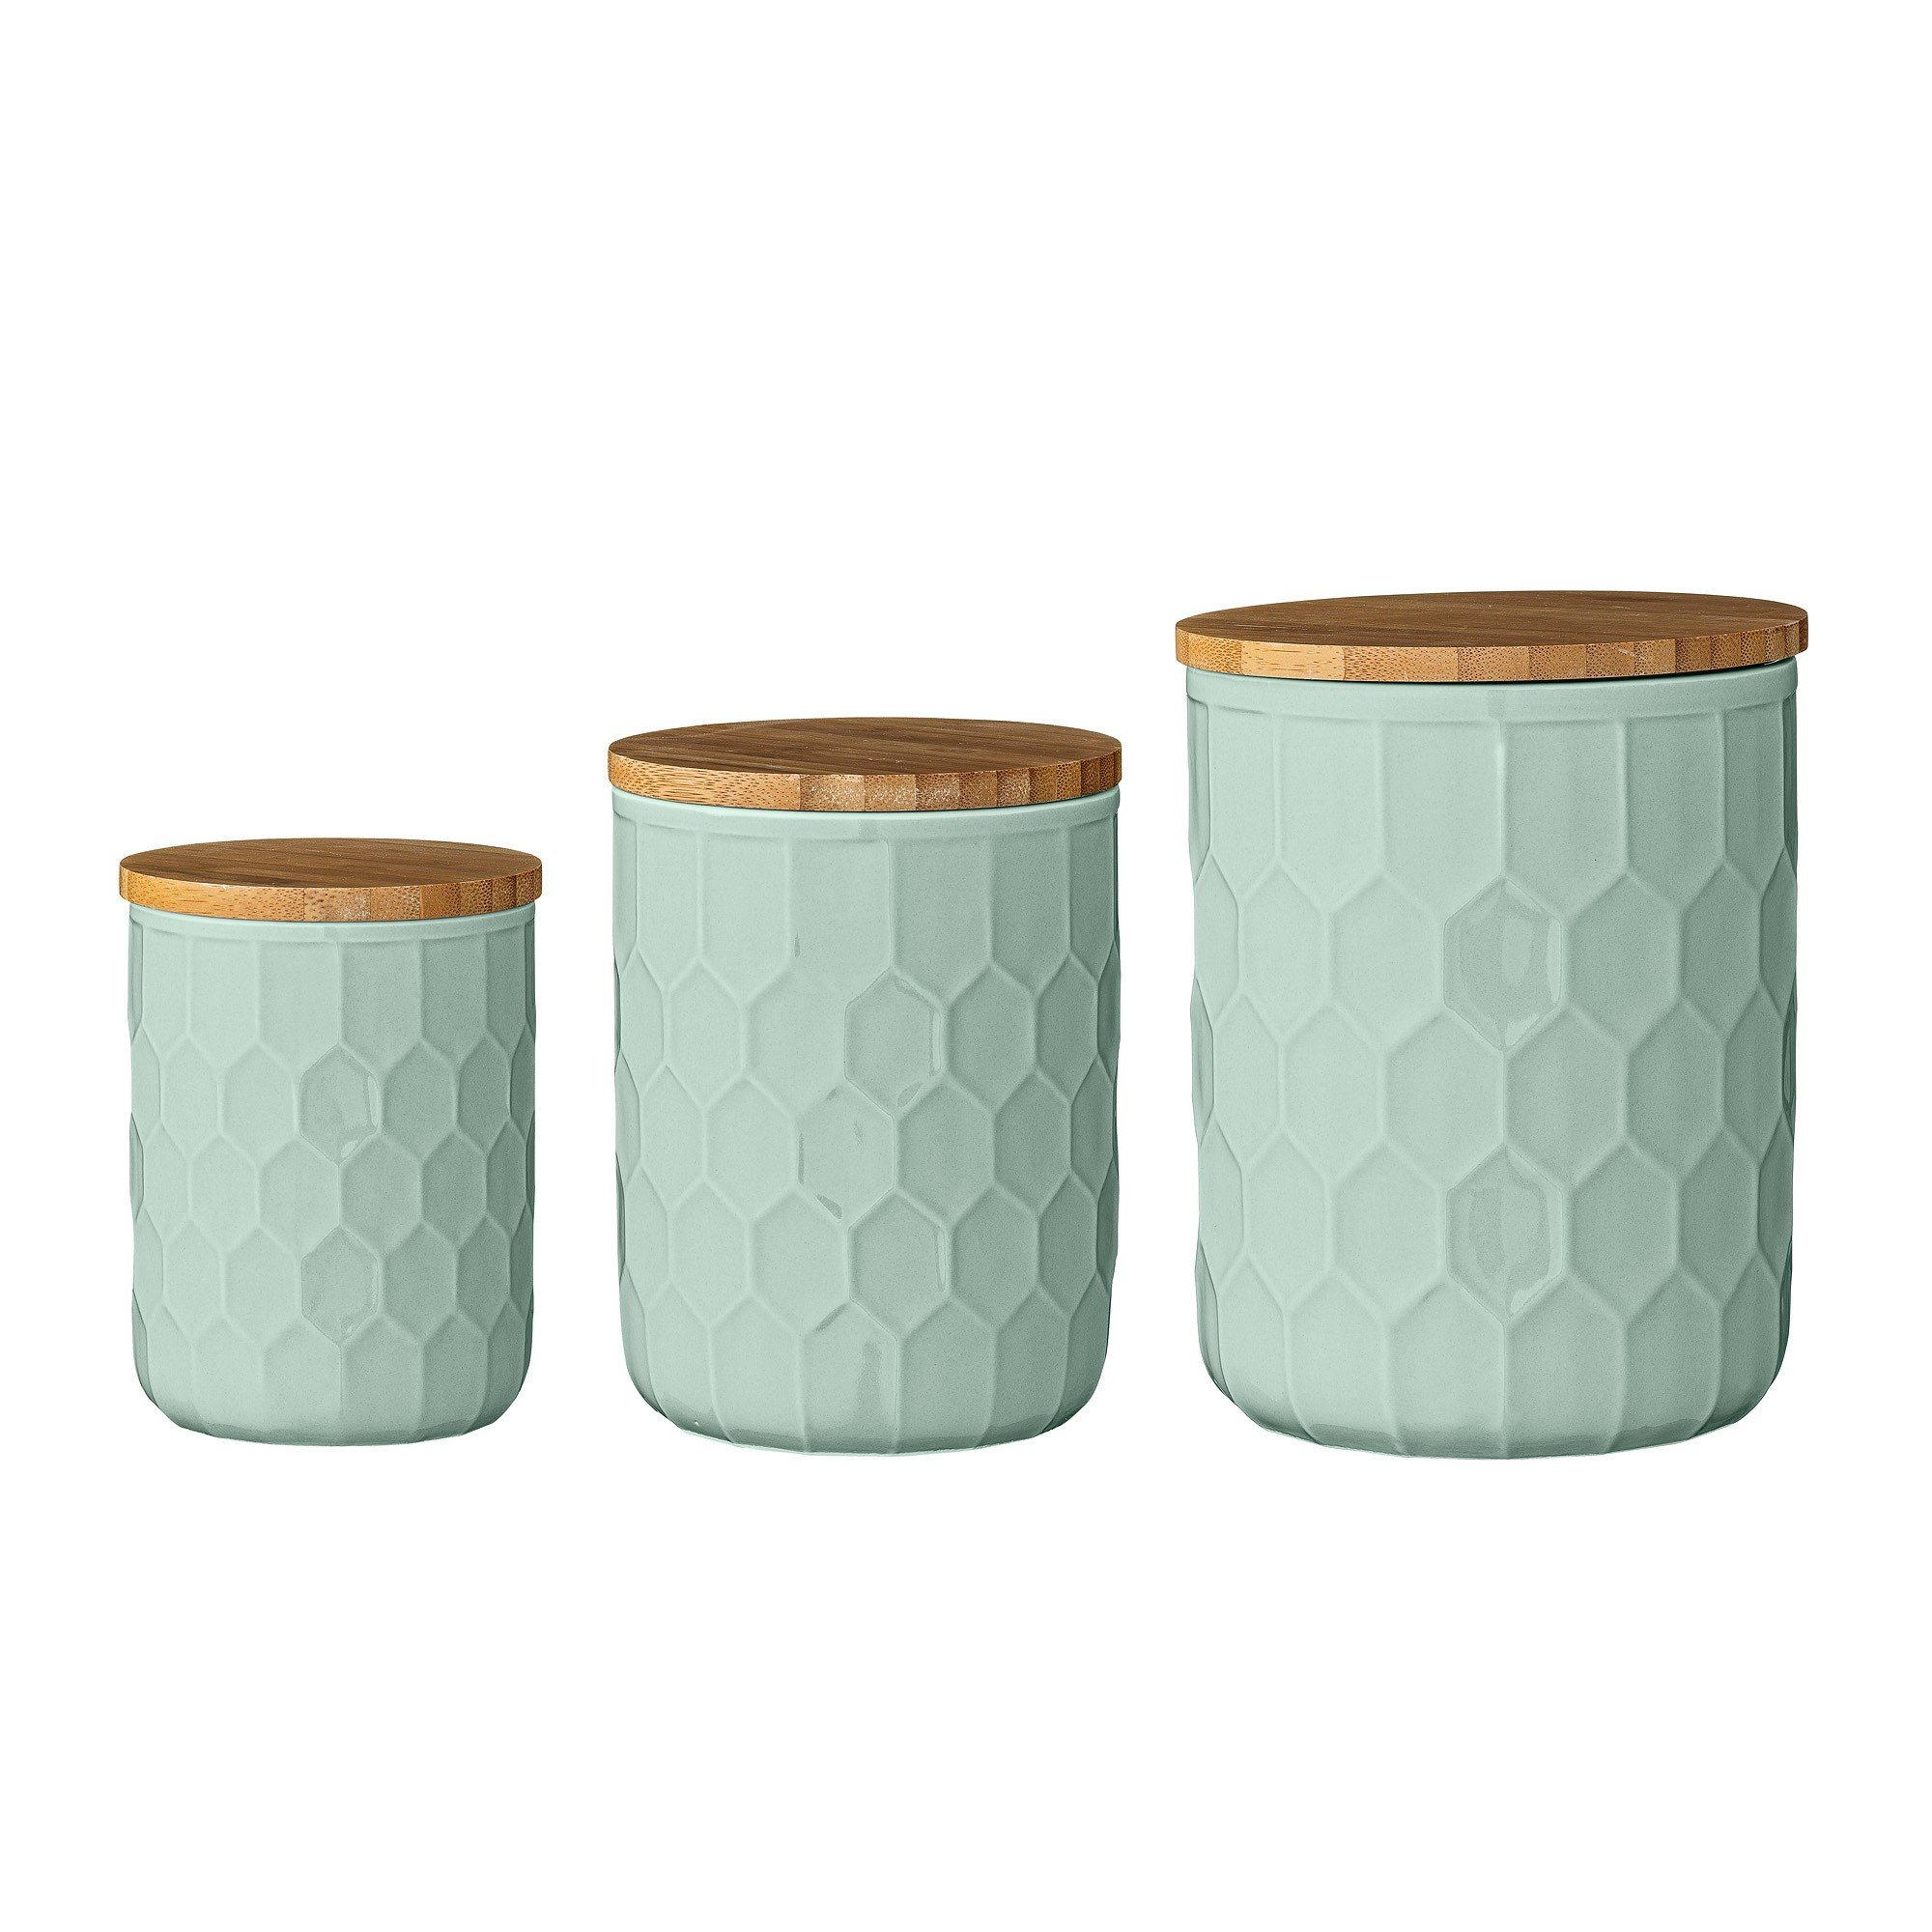 pojemniki kuchenne bloomingville 3 szt niskie bloomingville. Black Bedroom Furniture Sets. Home Design Ideas